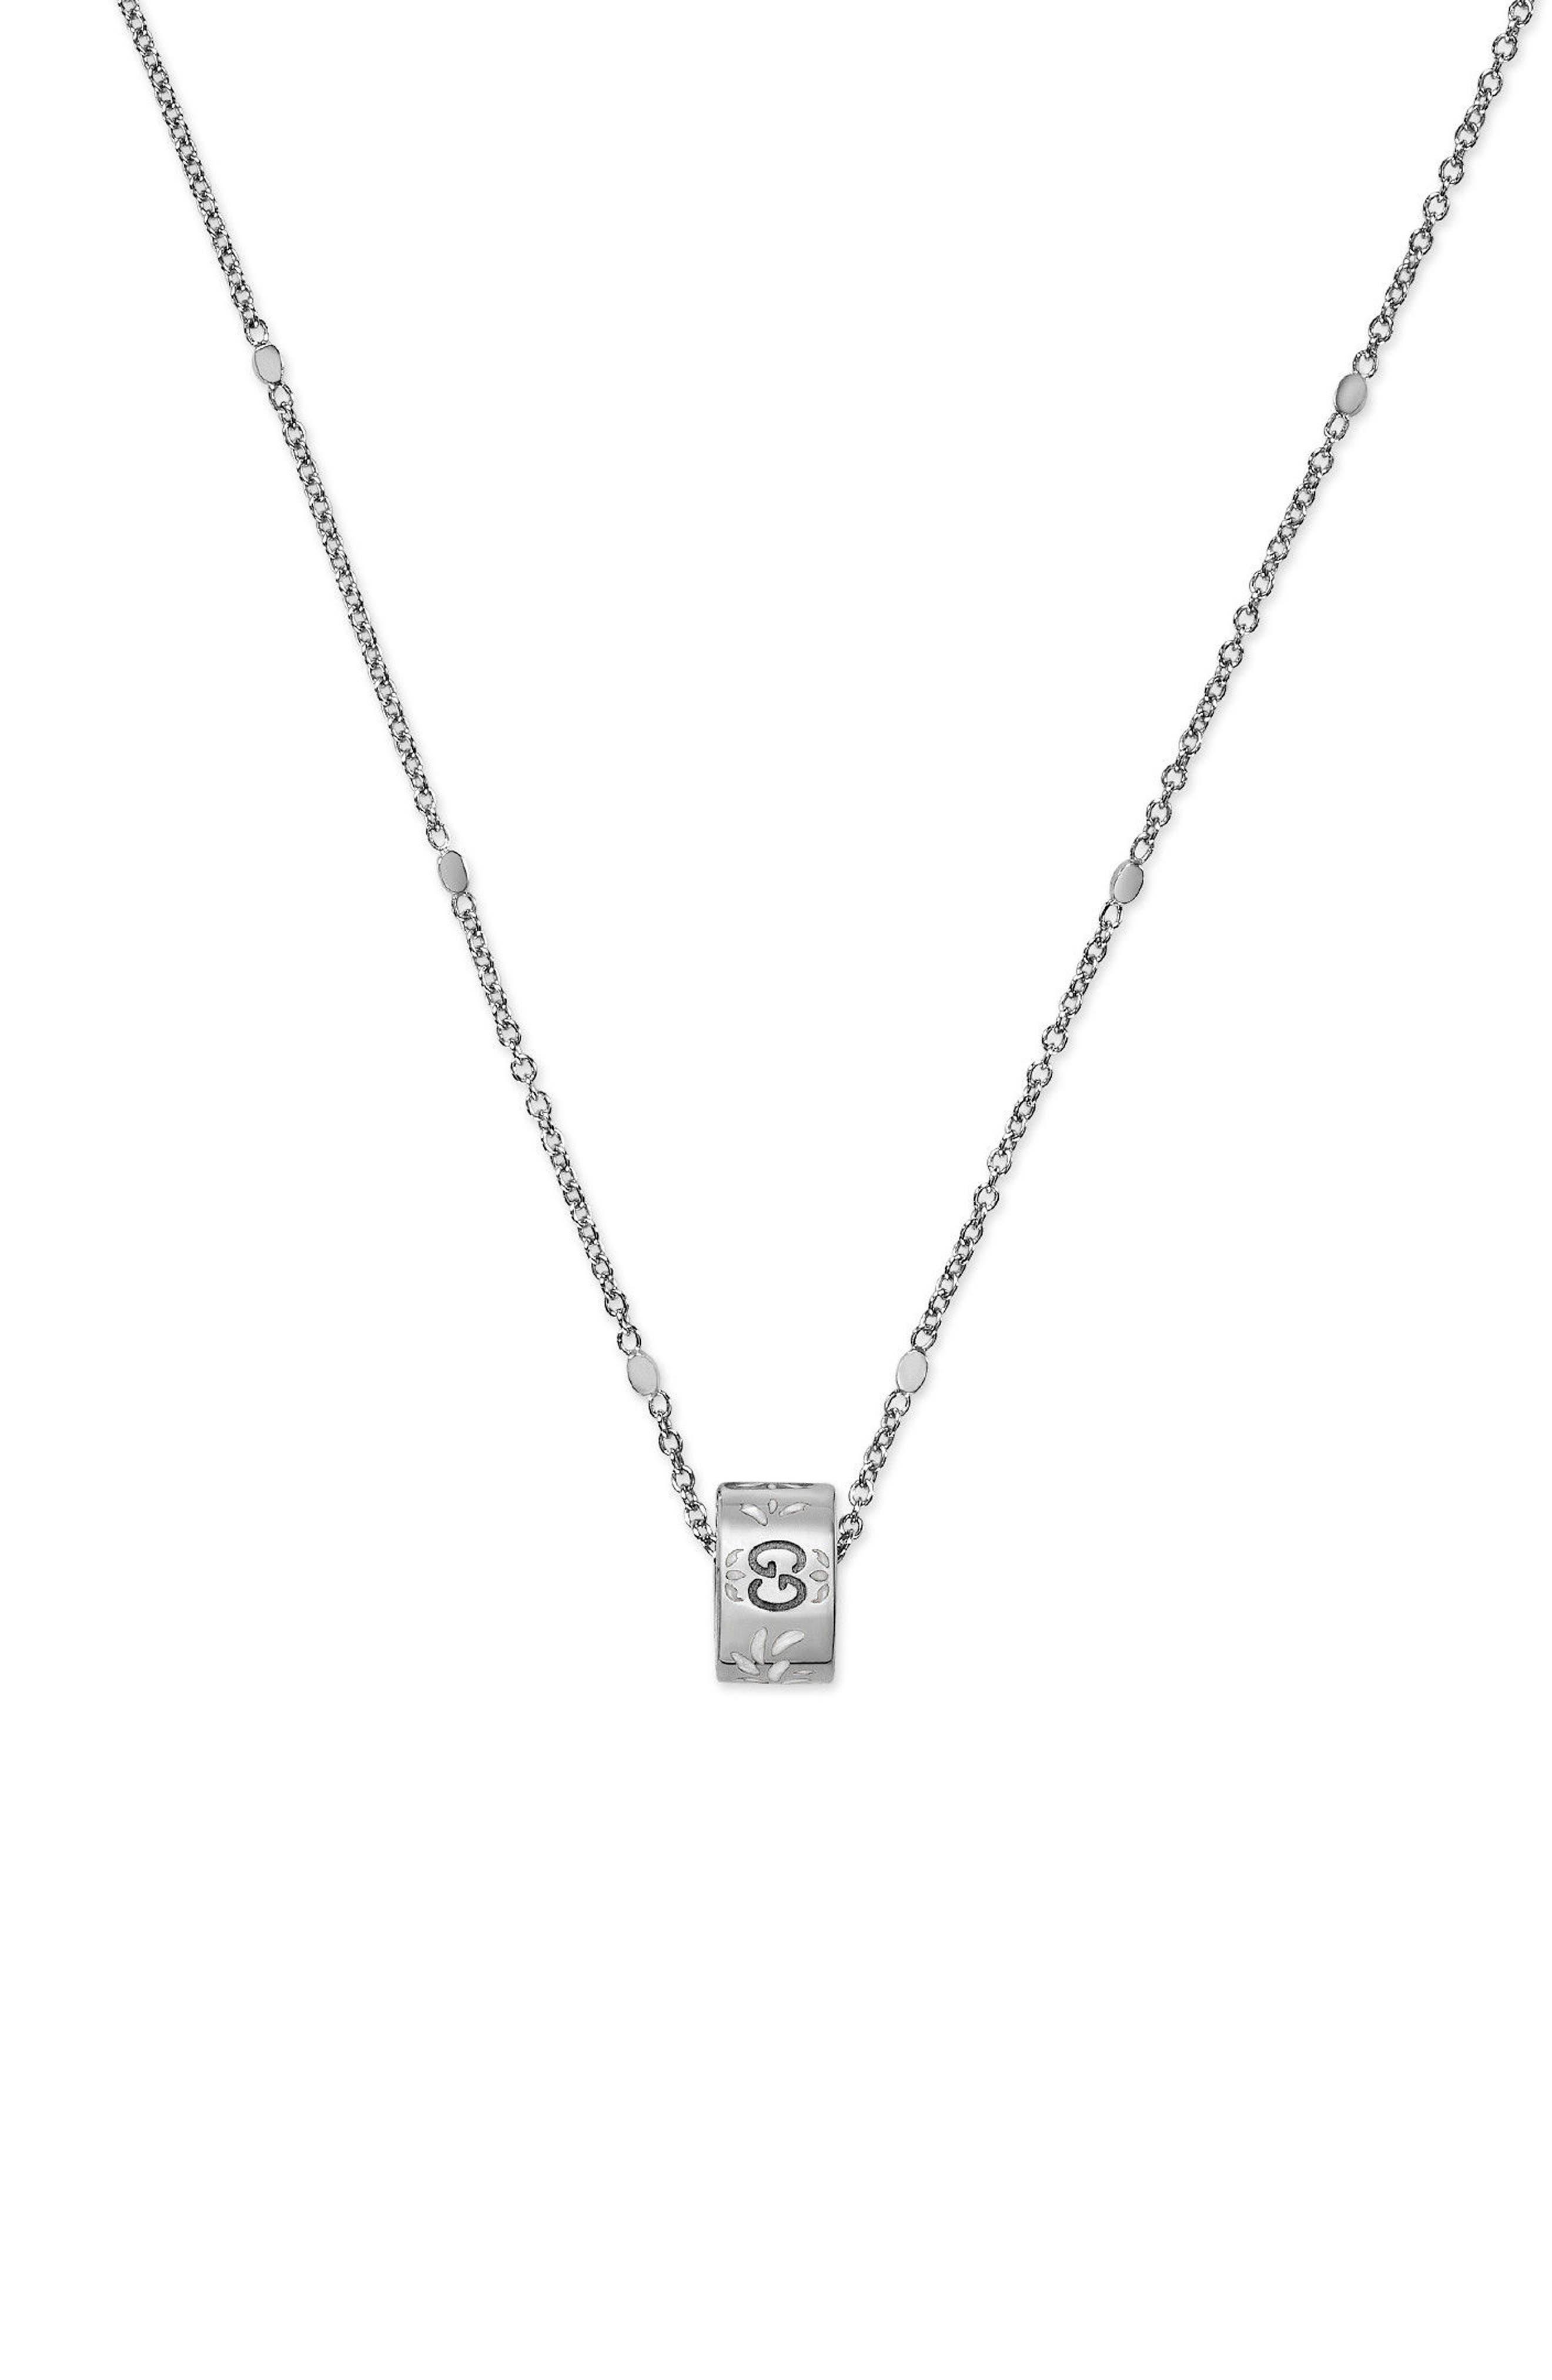 Icon Pendant Necklace,                             Main thumbnail 1, color,                             WHITE GOLD